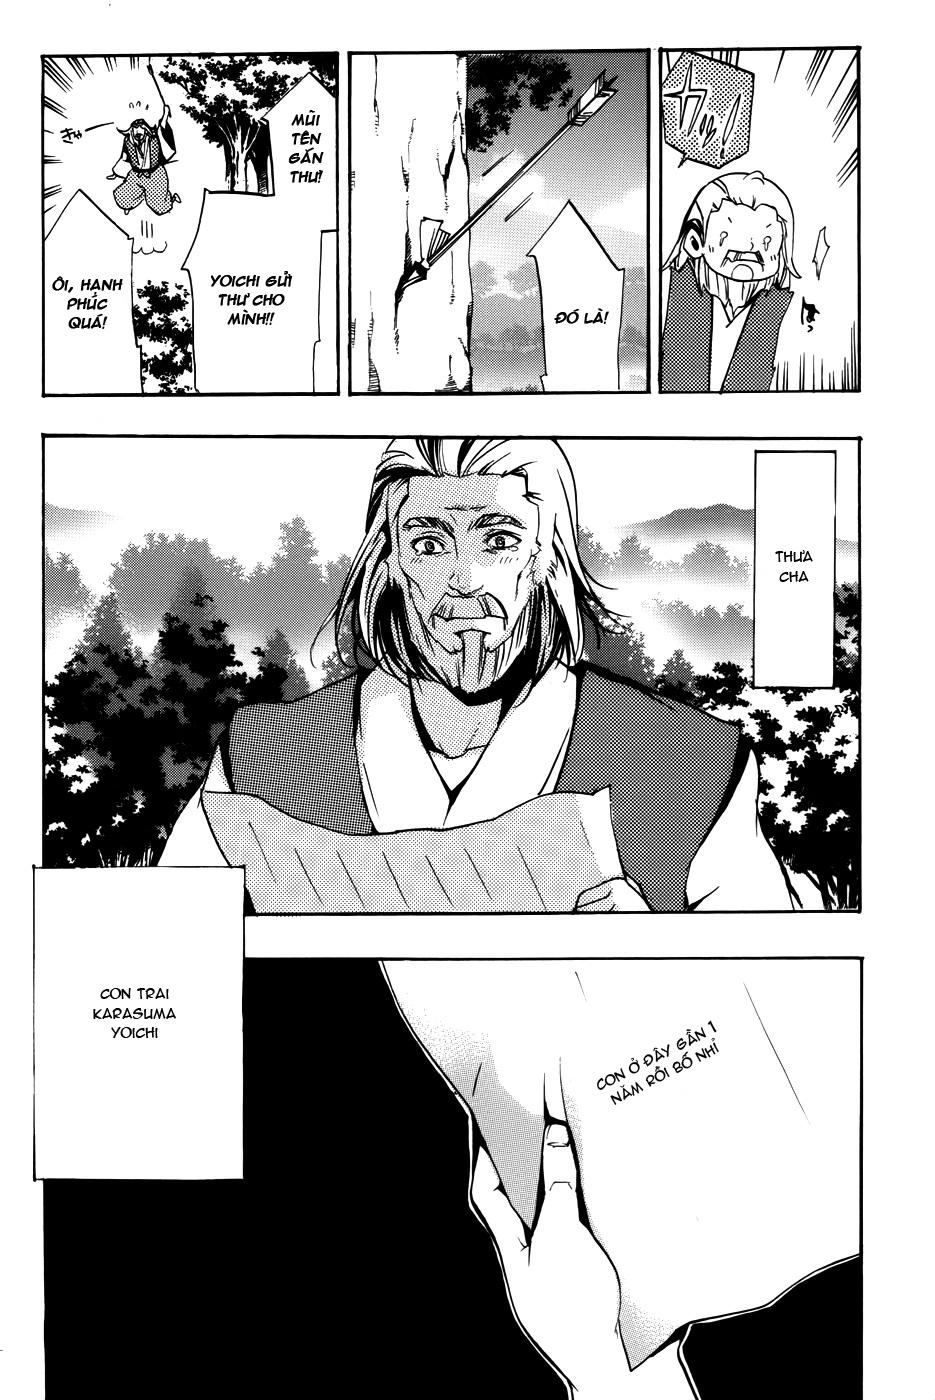 Ashita No Yoichi Chapter 58-end - Hamtruyen.vn